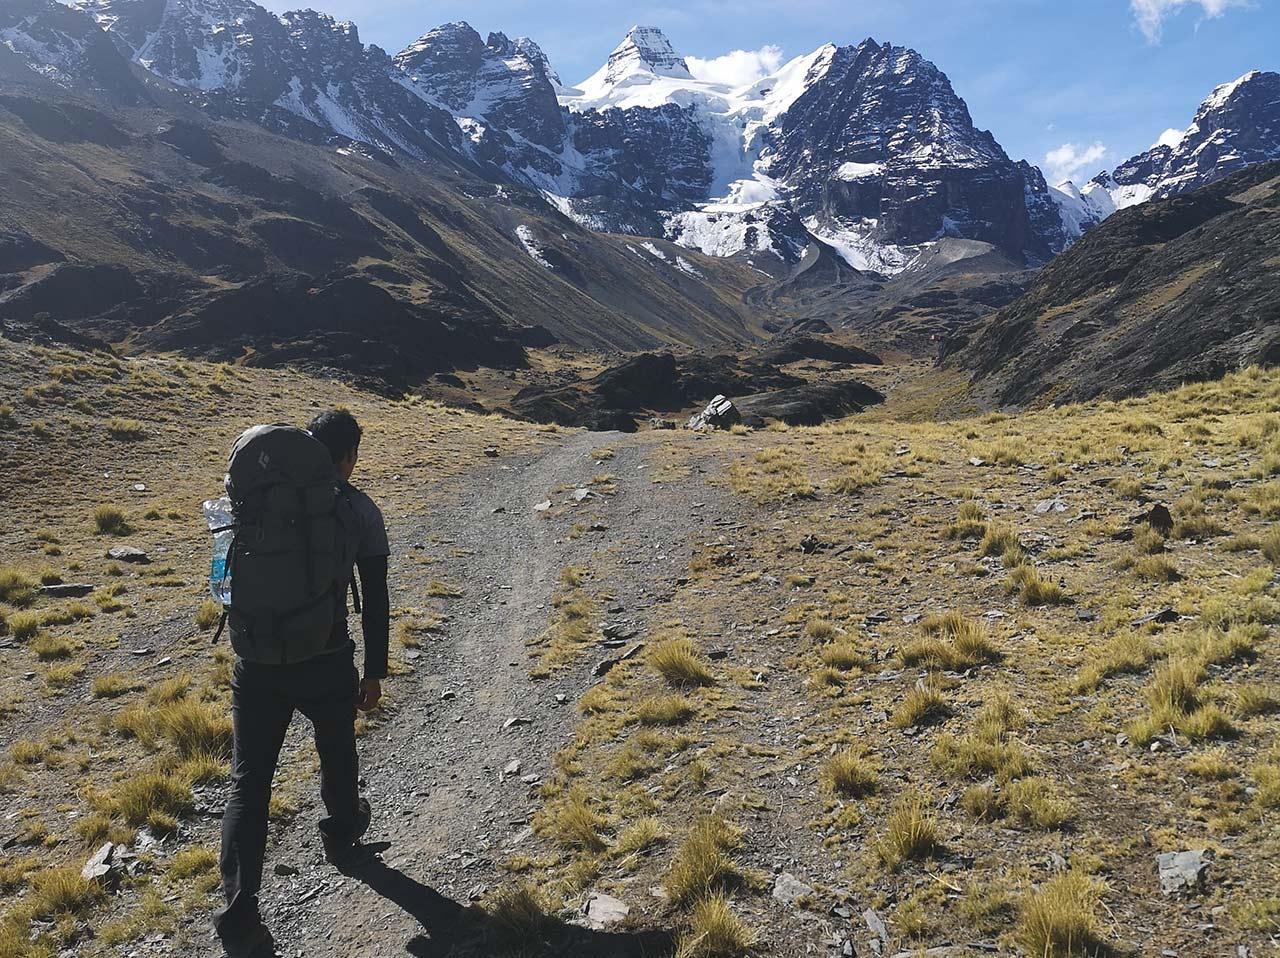 Retour d'aventure : l'appel du condor de Steve Farrugia